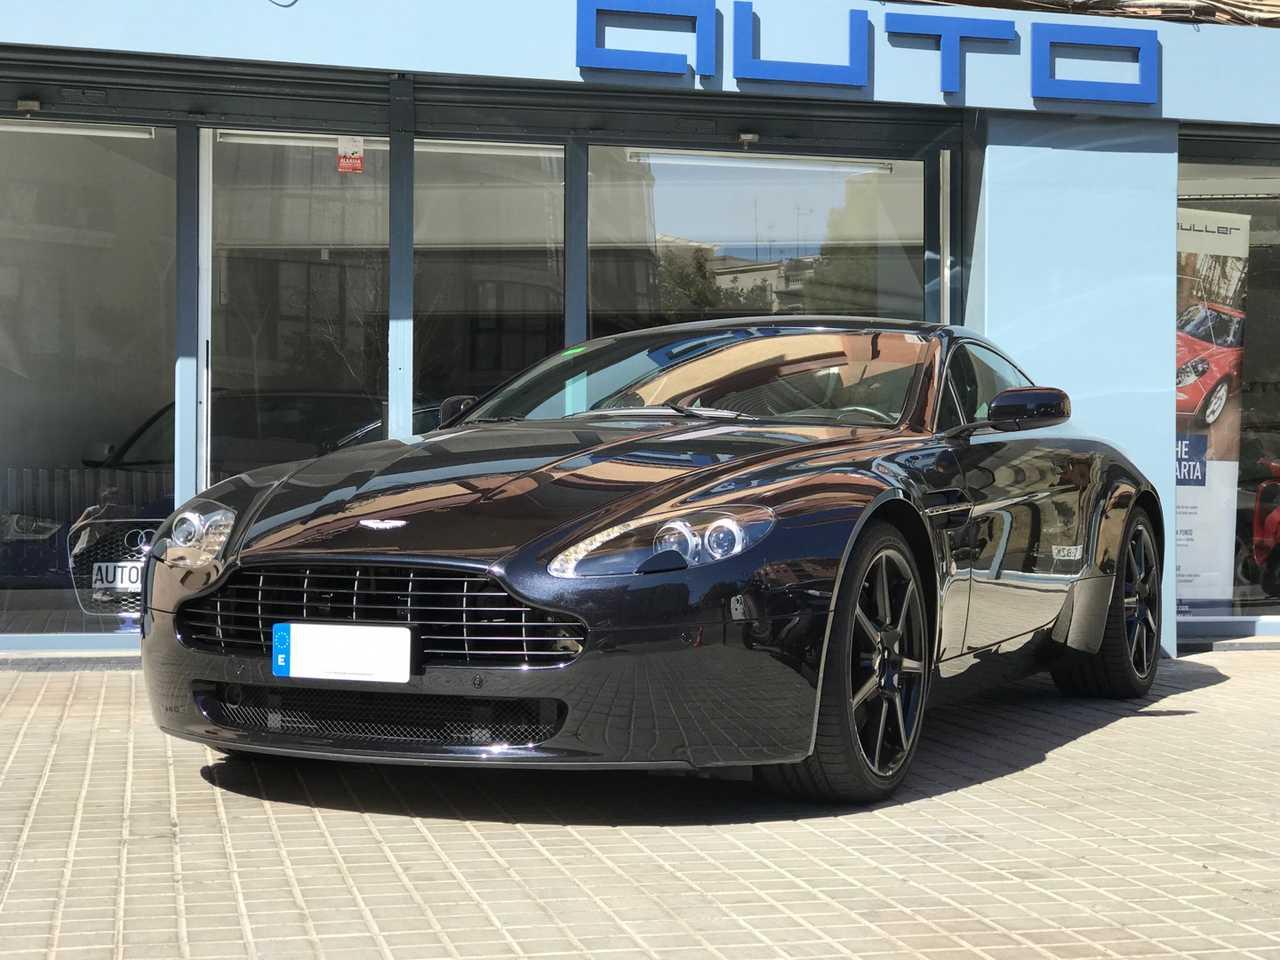 Aston martin Vantage Gasolina en Barcelona